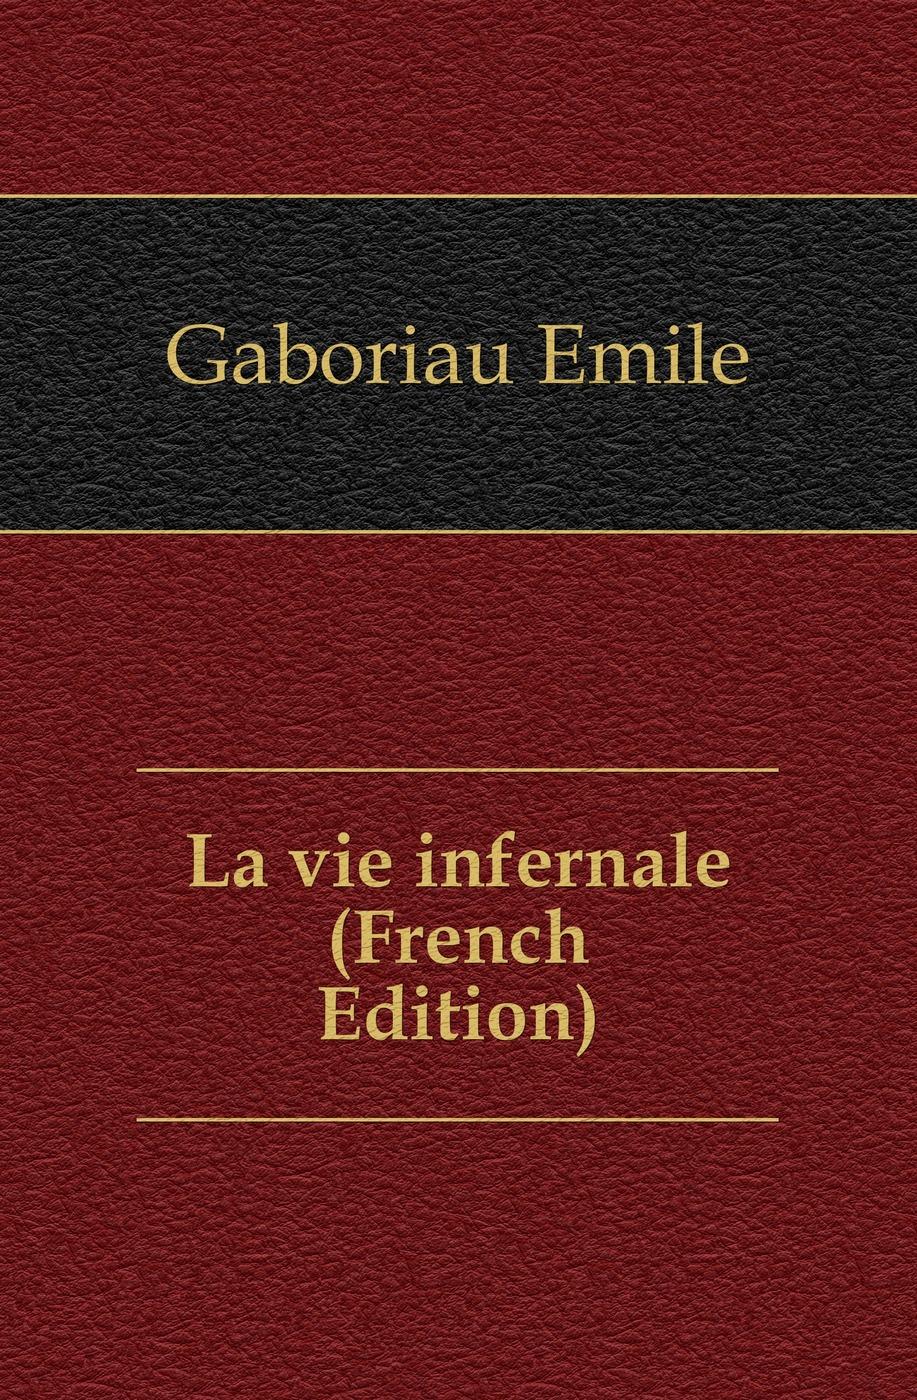 Gaboriau Emile La vie infernale (French Edition) цена и фото